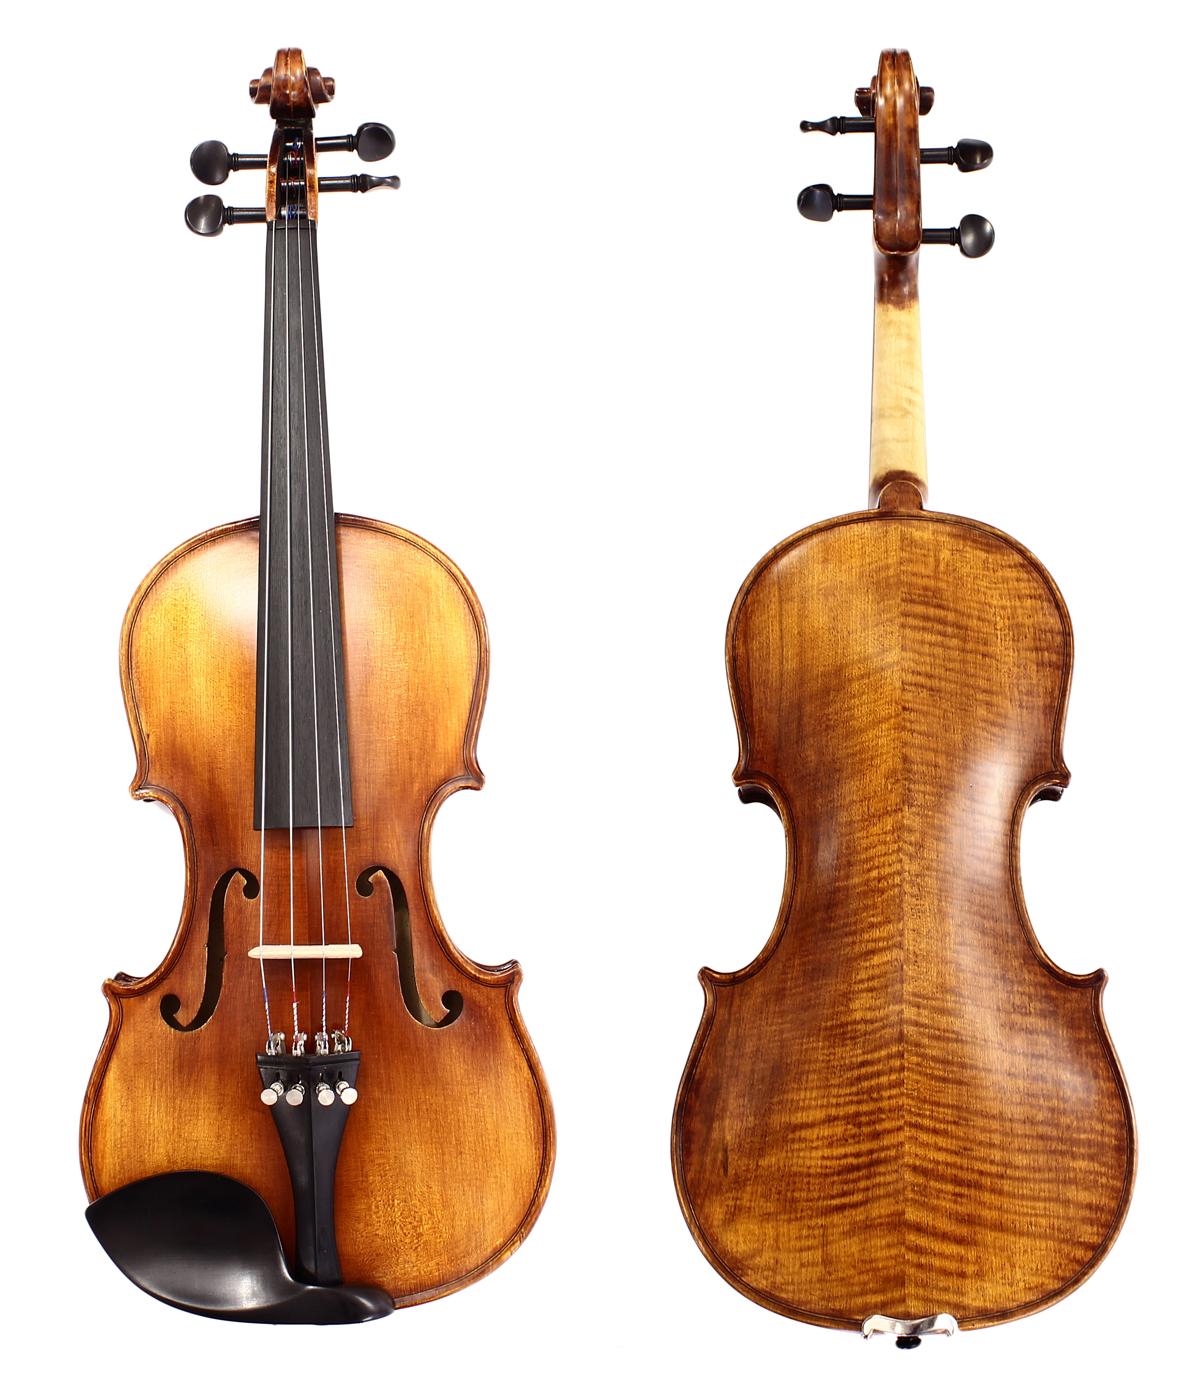 Violin Wallpaper: Violin Images Hd